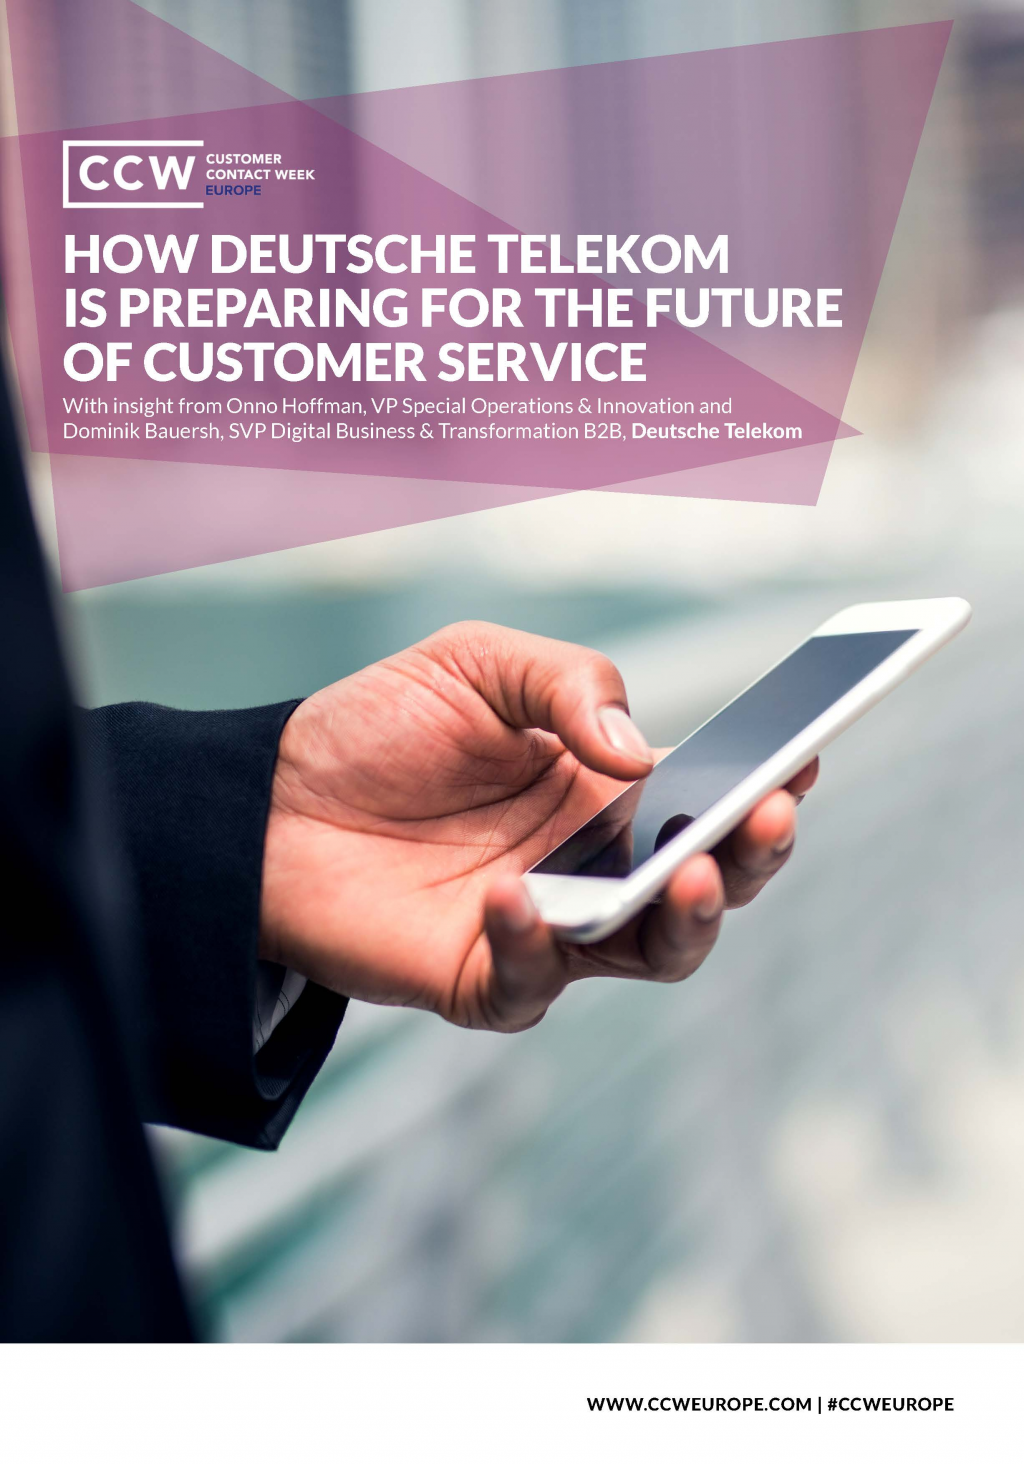 How Deutsche Telekom Is Preparing For The Future Of Customer Service